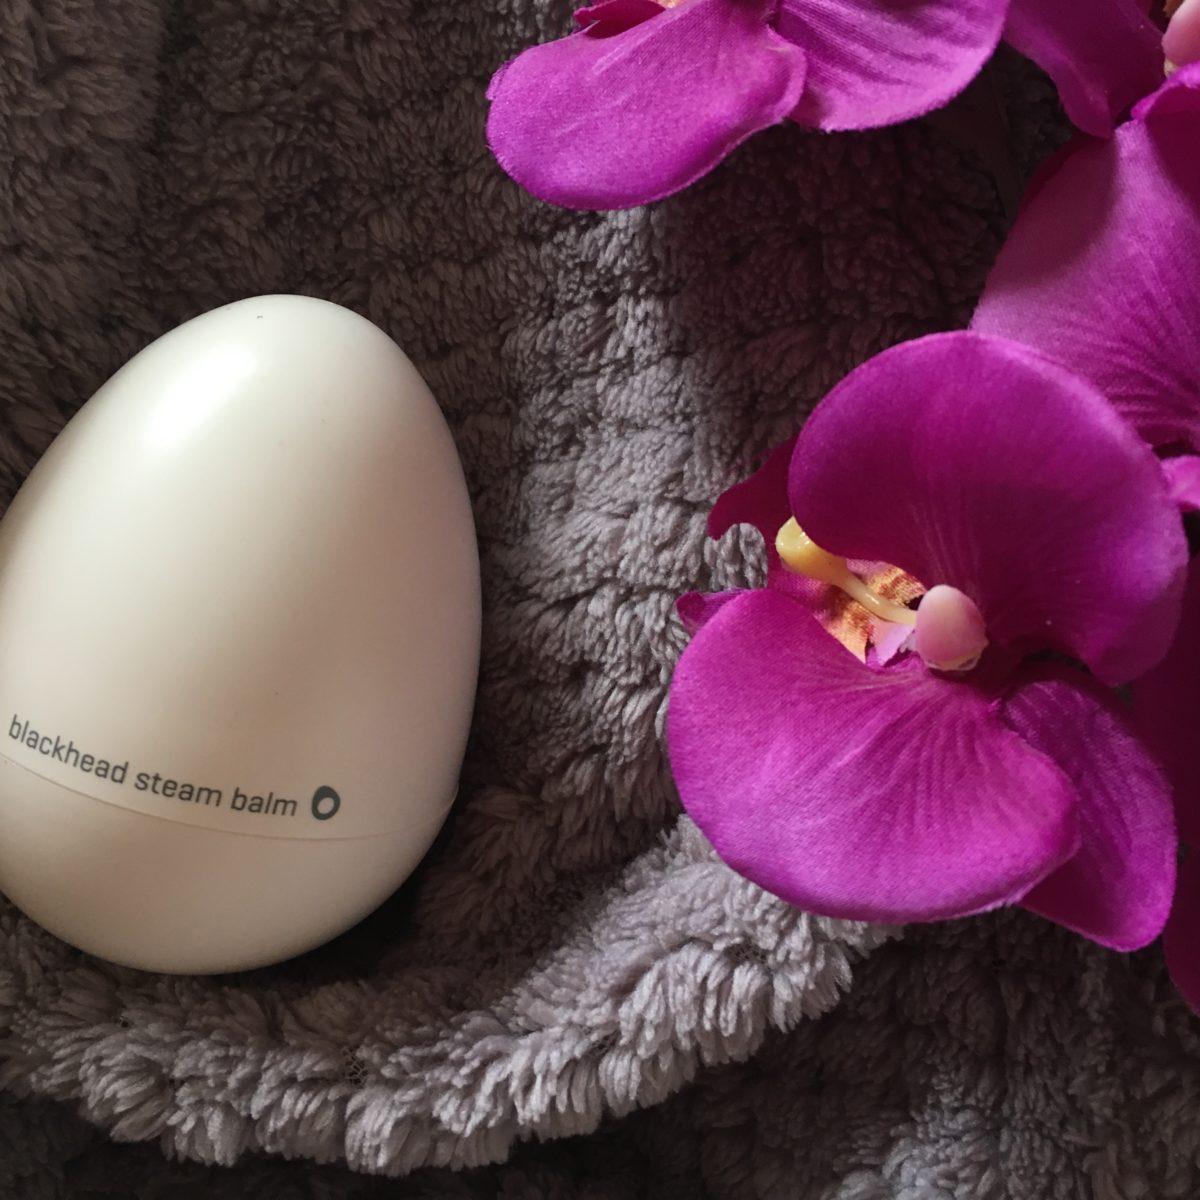 Egg pore Tony Moly peeling annemarie